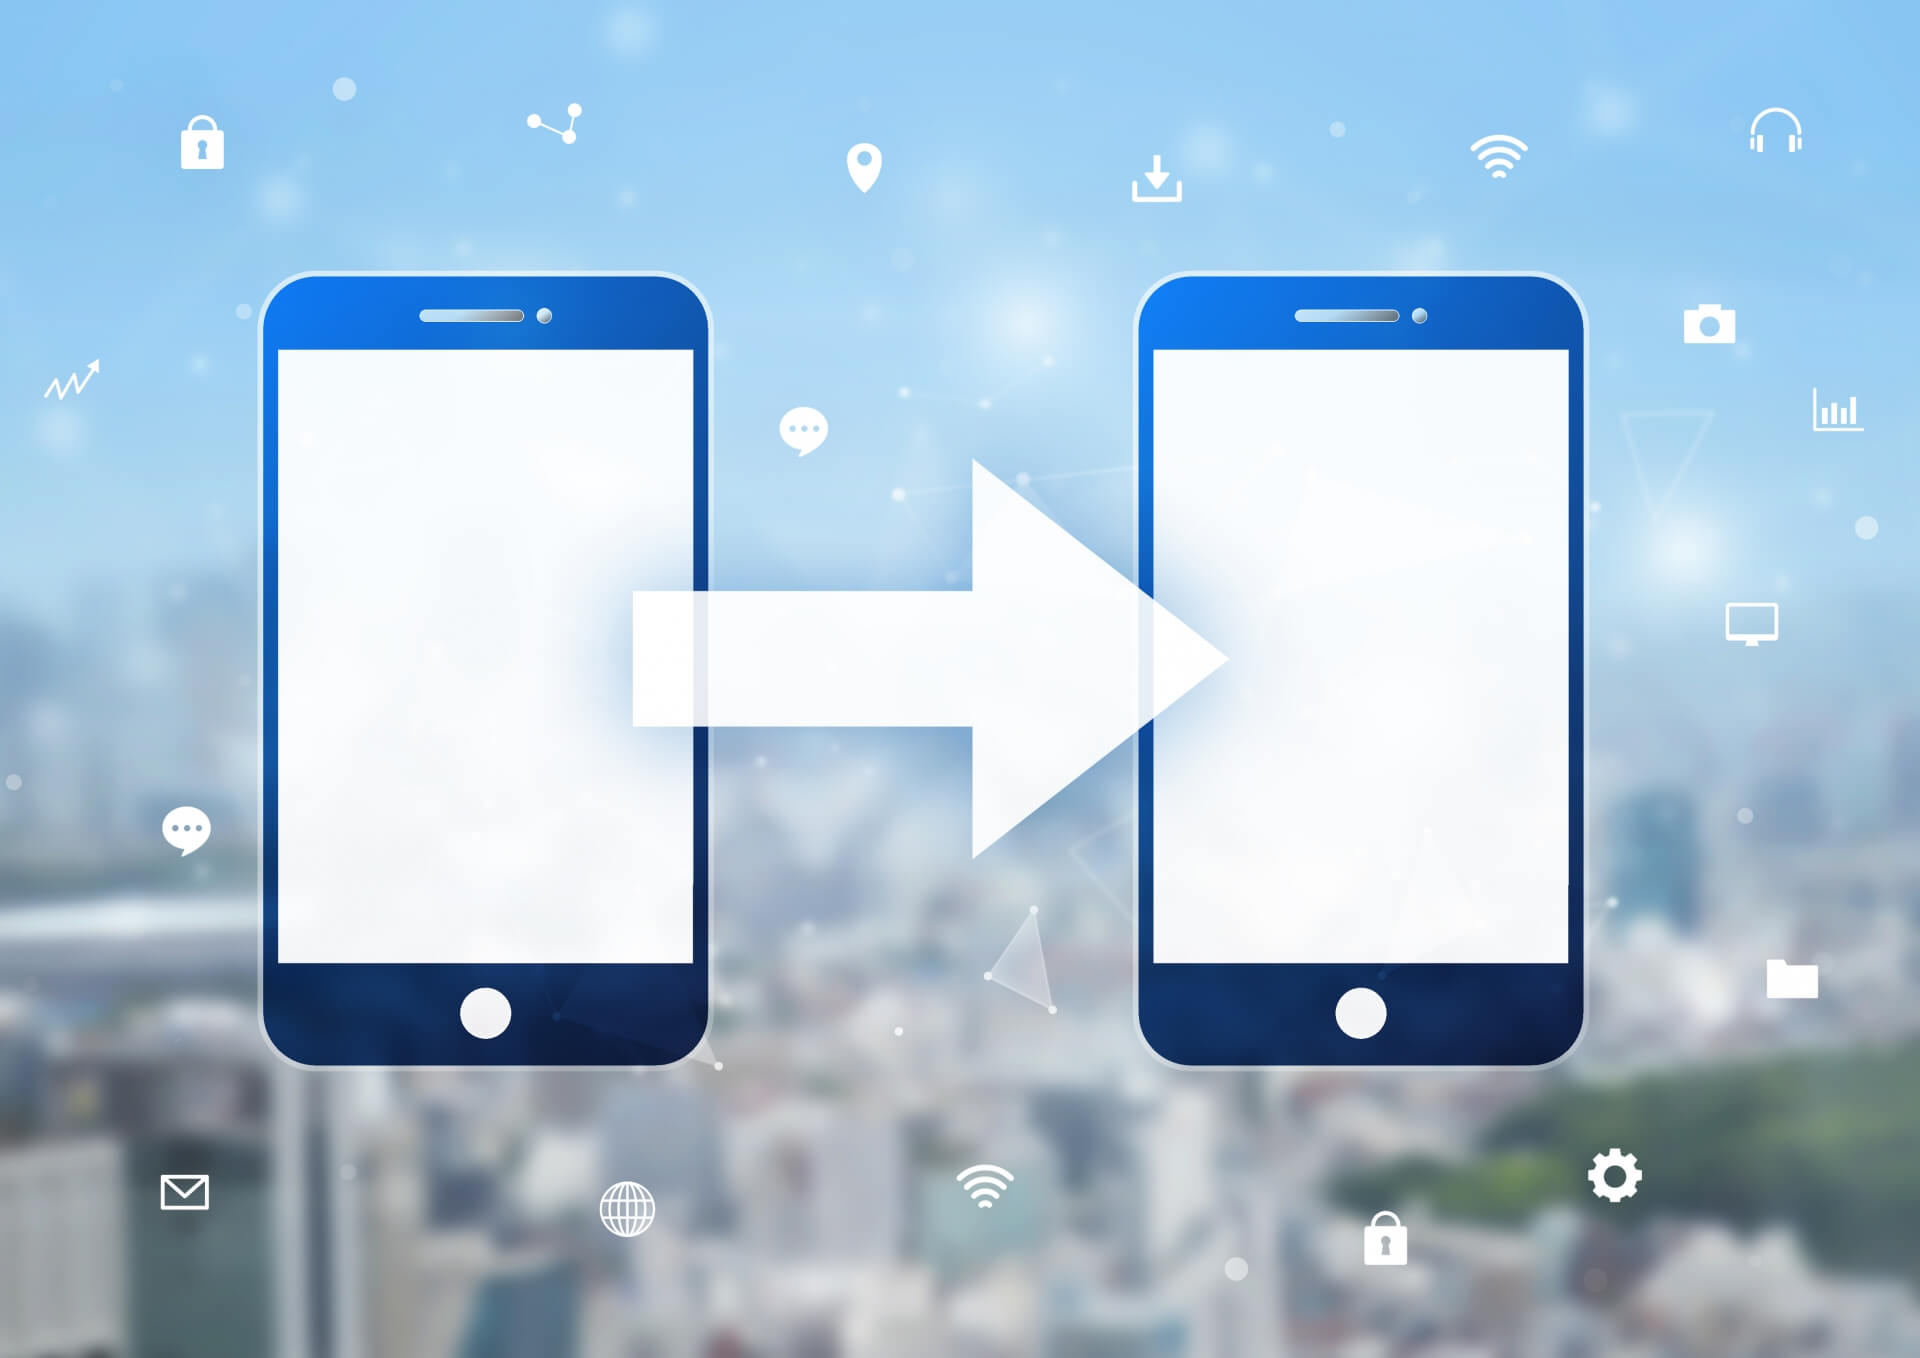 iPhoneの簡単なデータ移行方法や得する乗り換え方法を公開